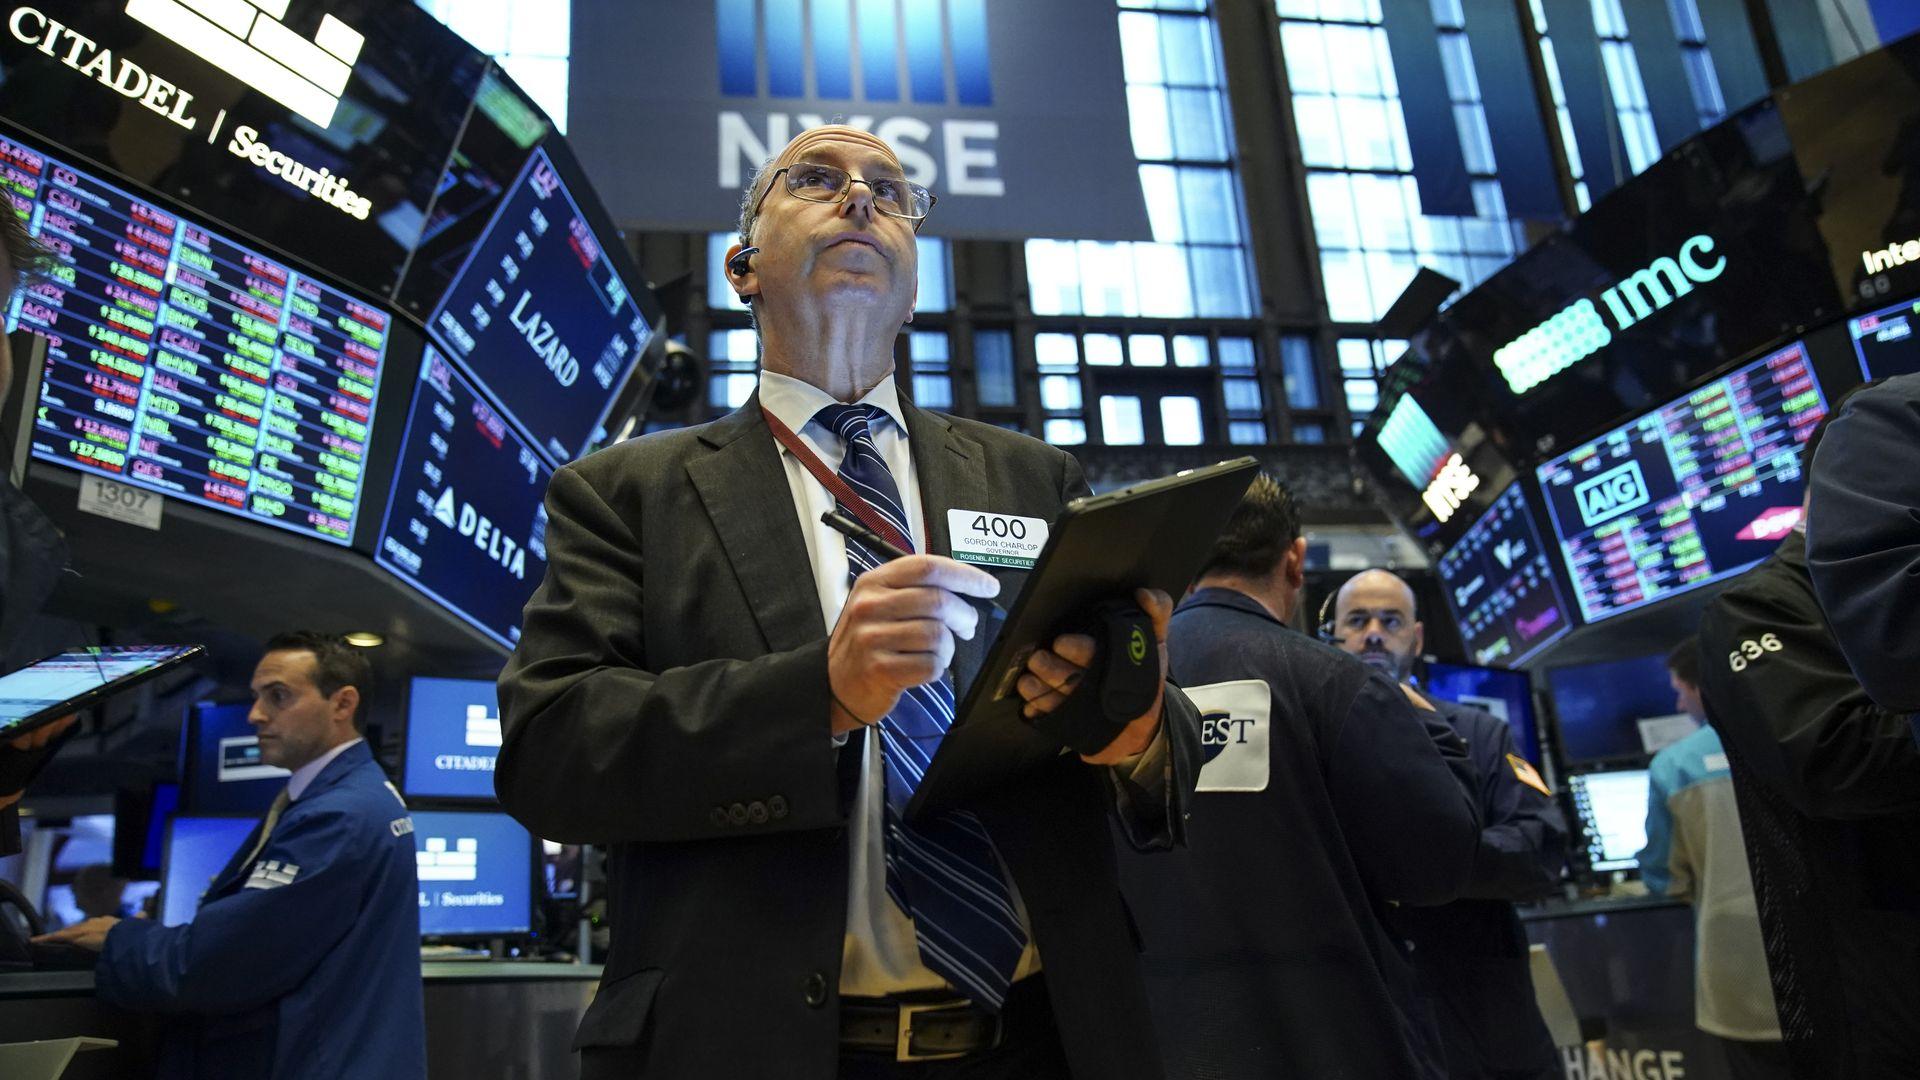 The floor of the New York Stock Exchange last month